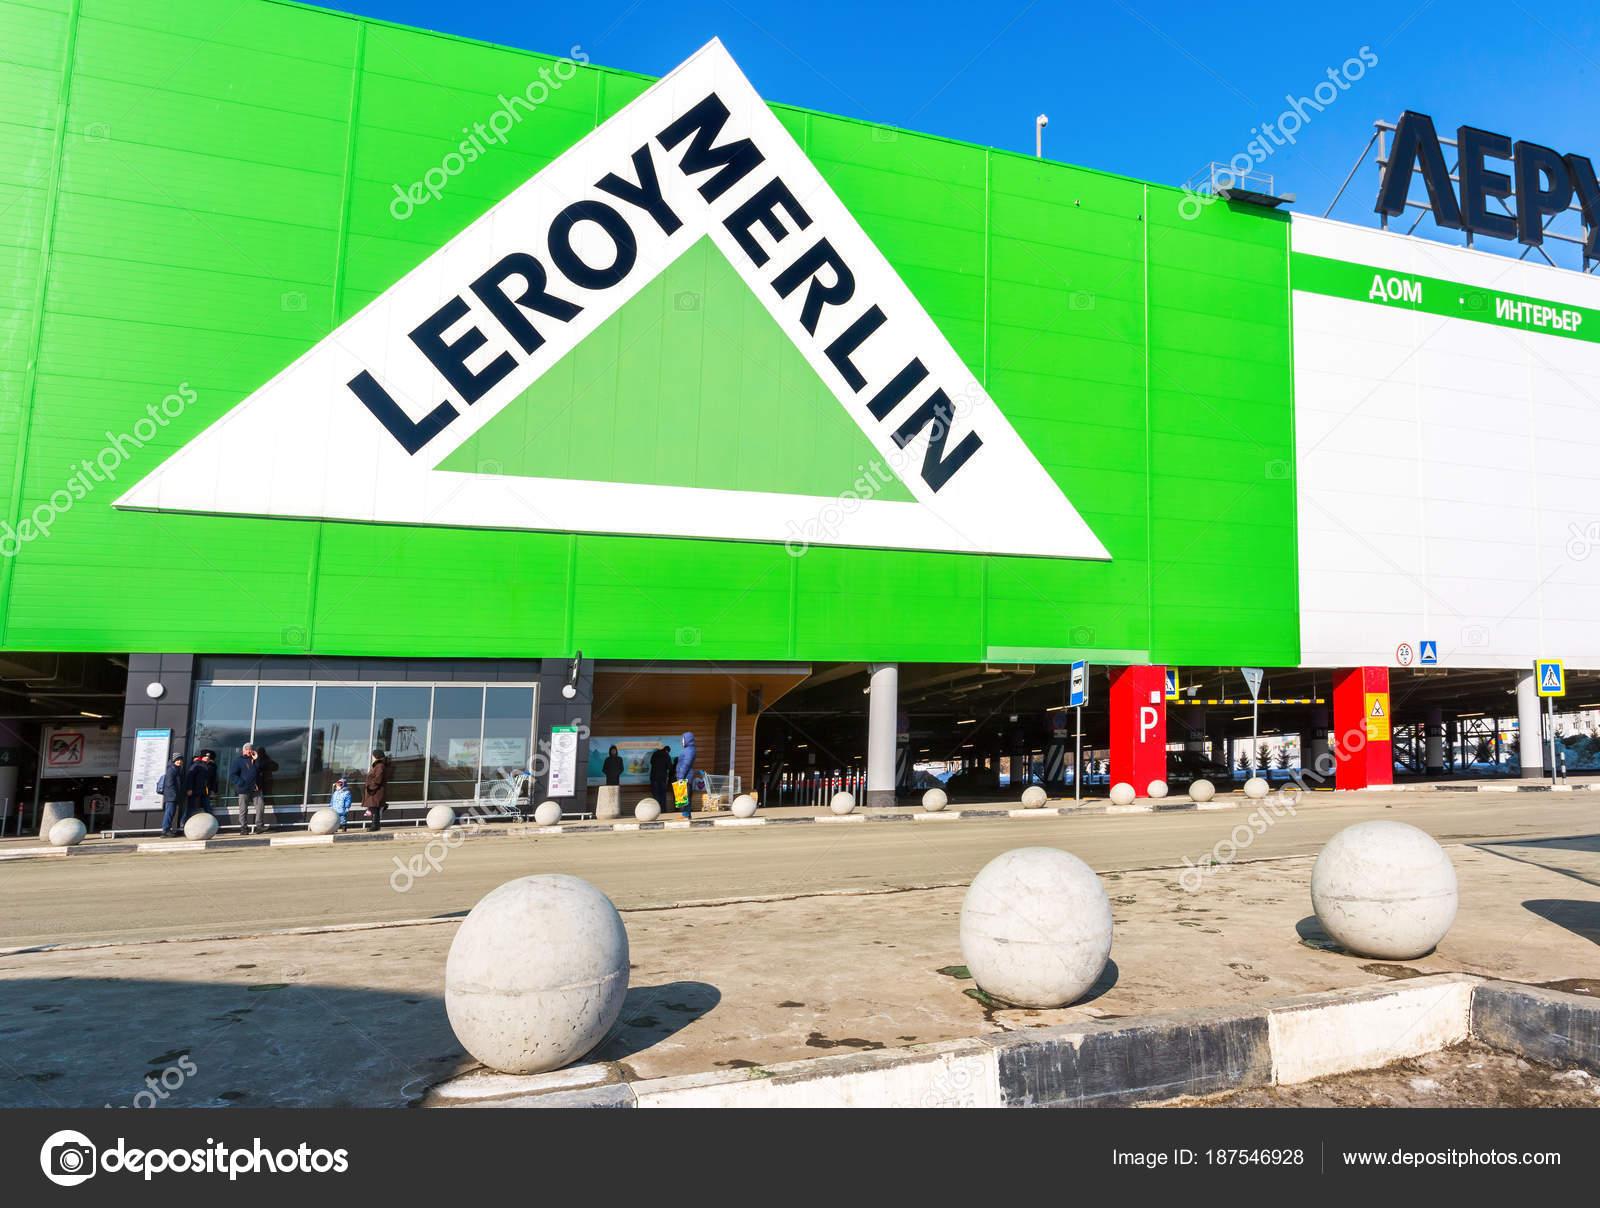 Leroy merlin magasin de samara en journ e ensoleill e - Magasin leroy merlin en france ...